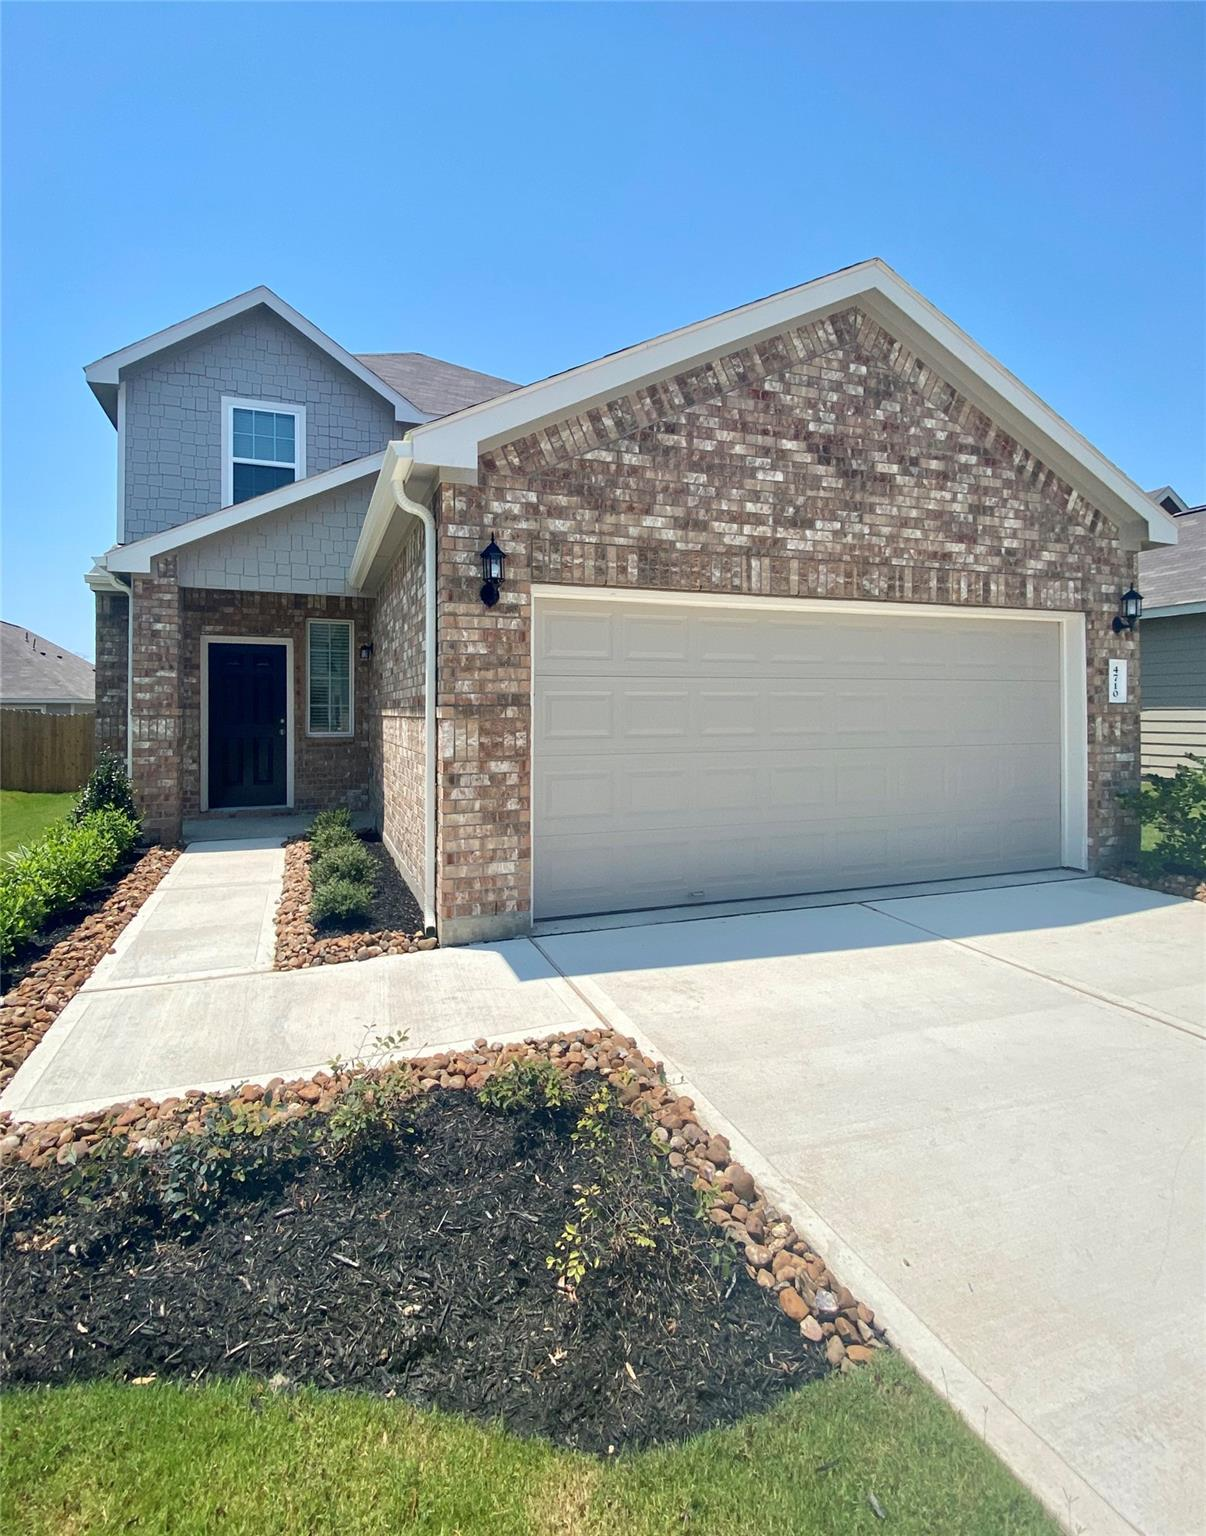 4710 Los Pines Way Property Photo - Bryan, TX real estate listing